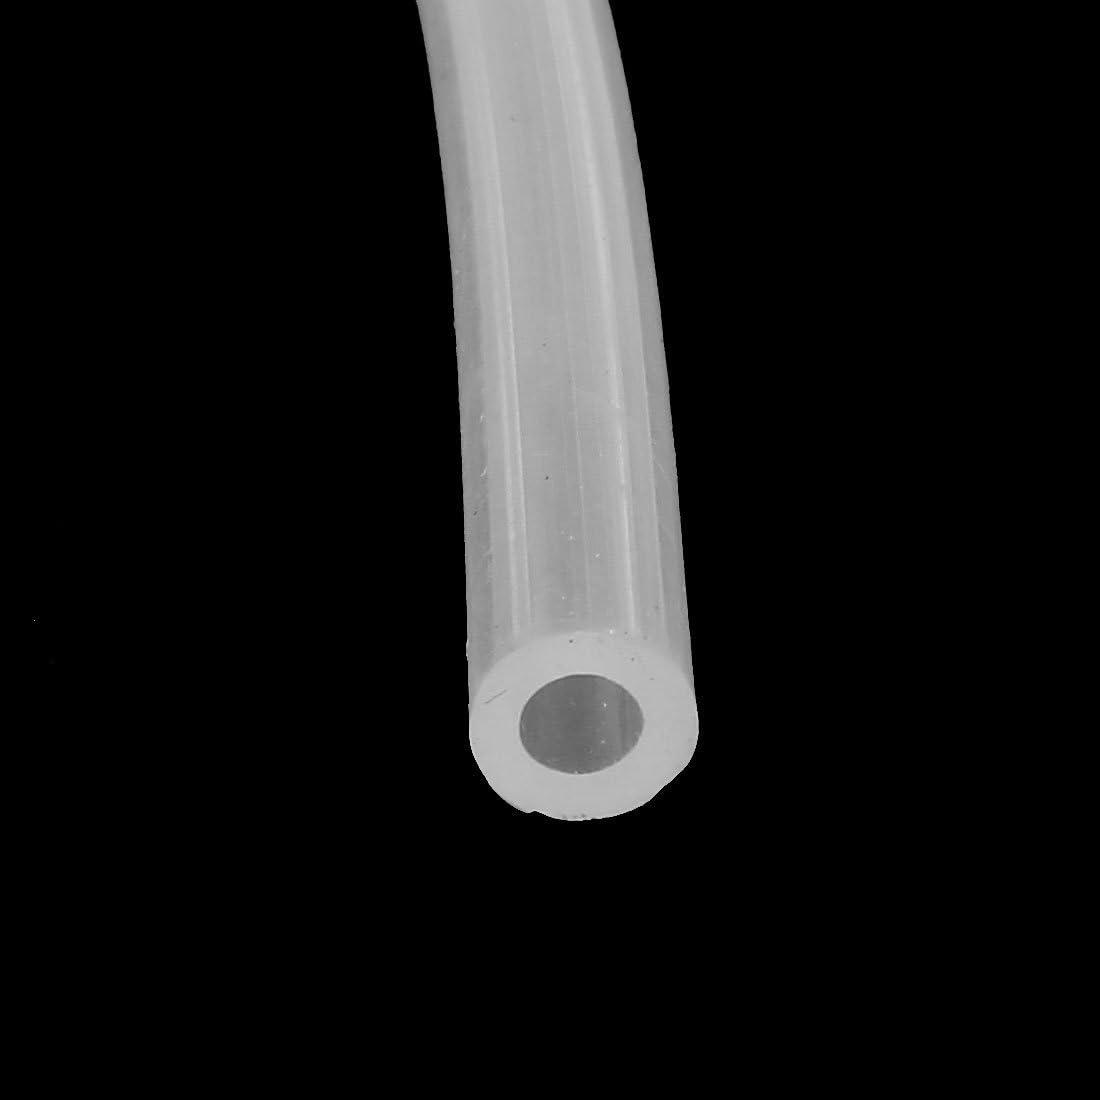 metal DealMux a15121600ux0991 Tubo de silicona de grado alimenticio de 4 mm x 7 mm Tubo de manguera de bomba de aire de agua de cerveza 0.16 2 m